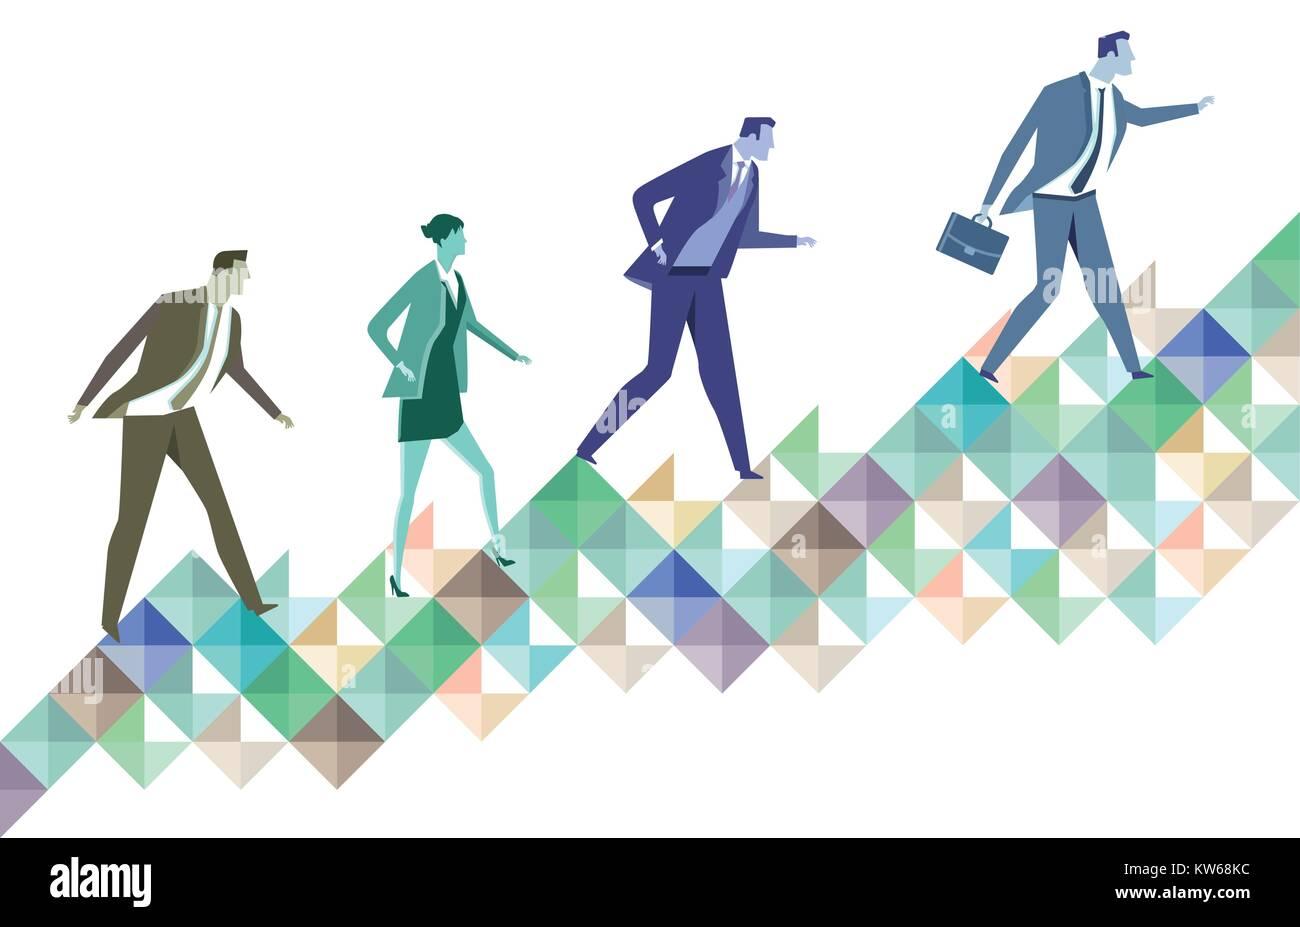 Career ladder, symbol illustration - Stock Vector